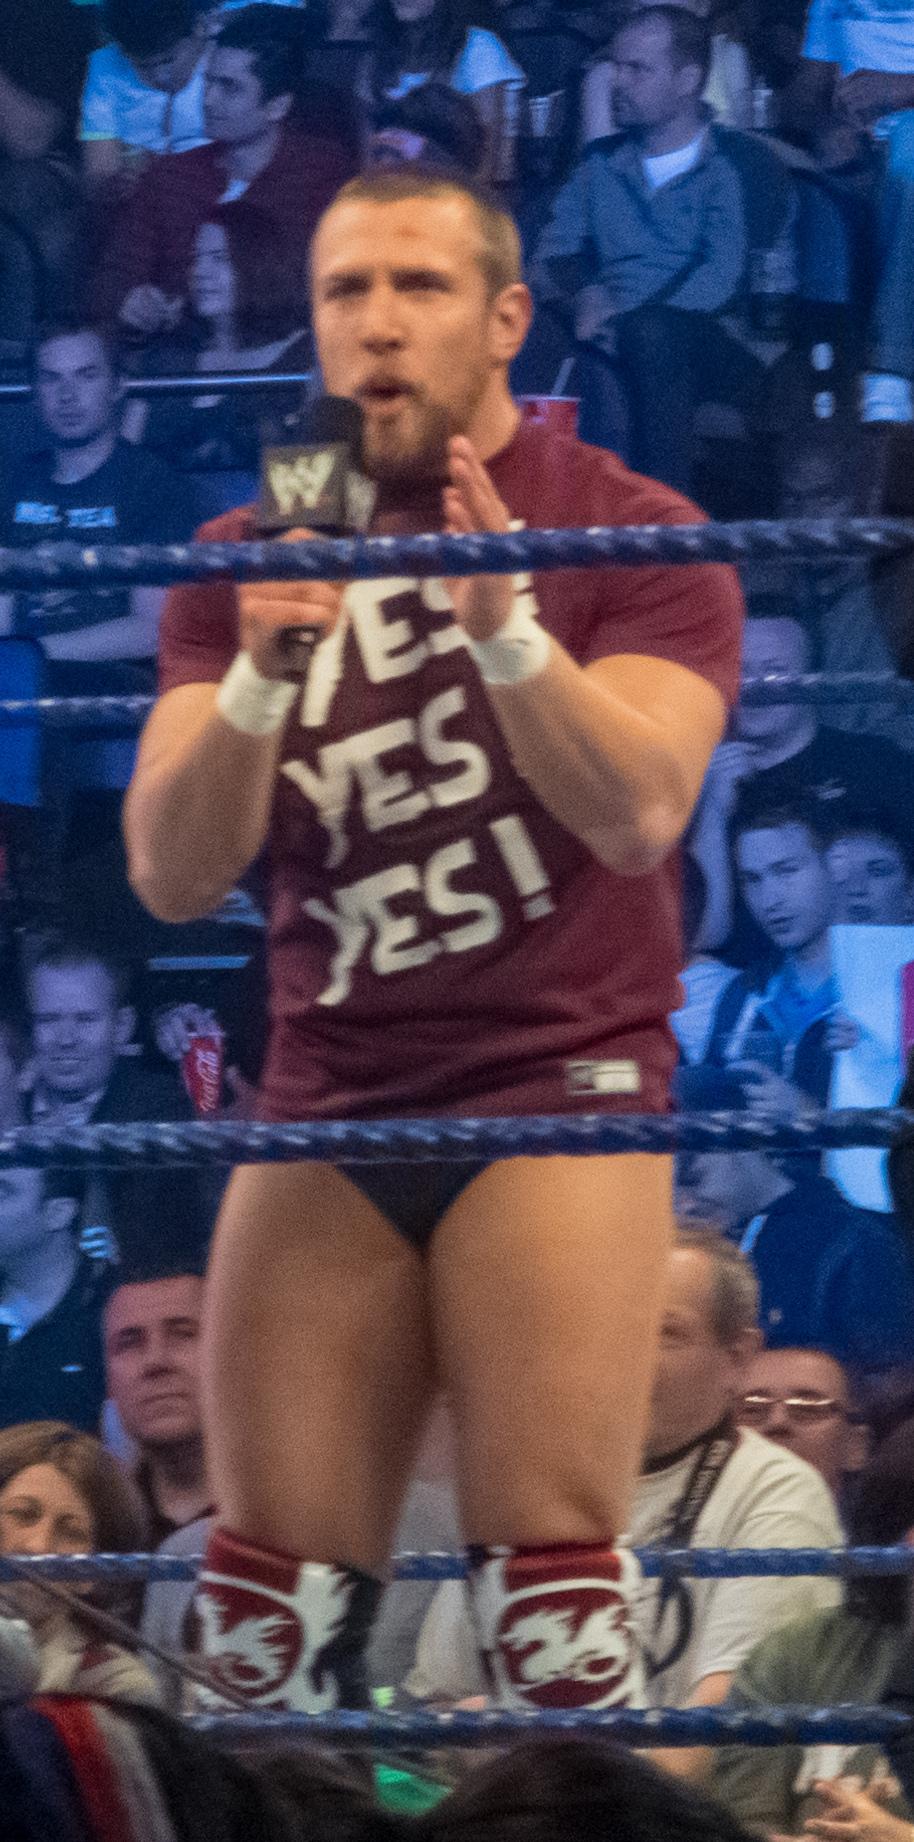 WWE velocità dating promo